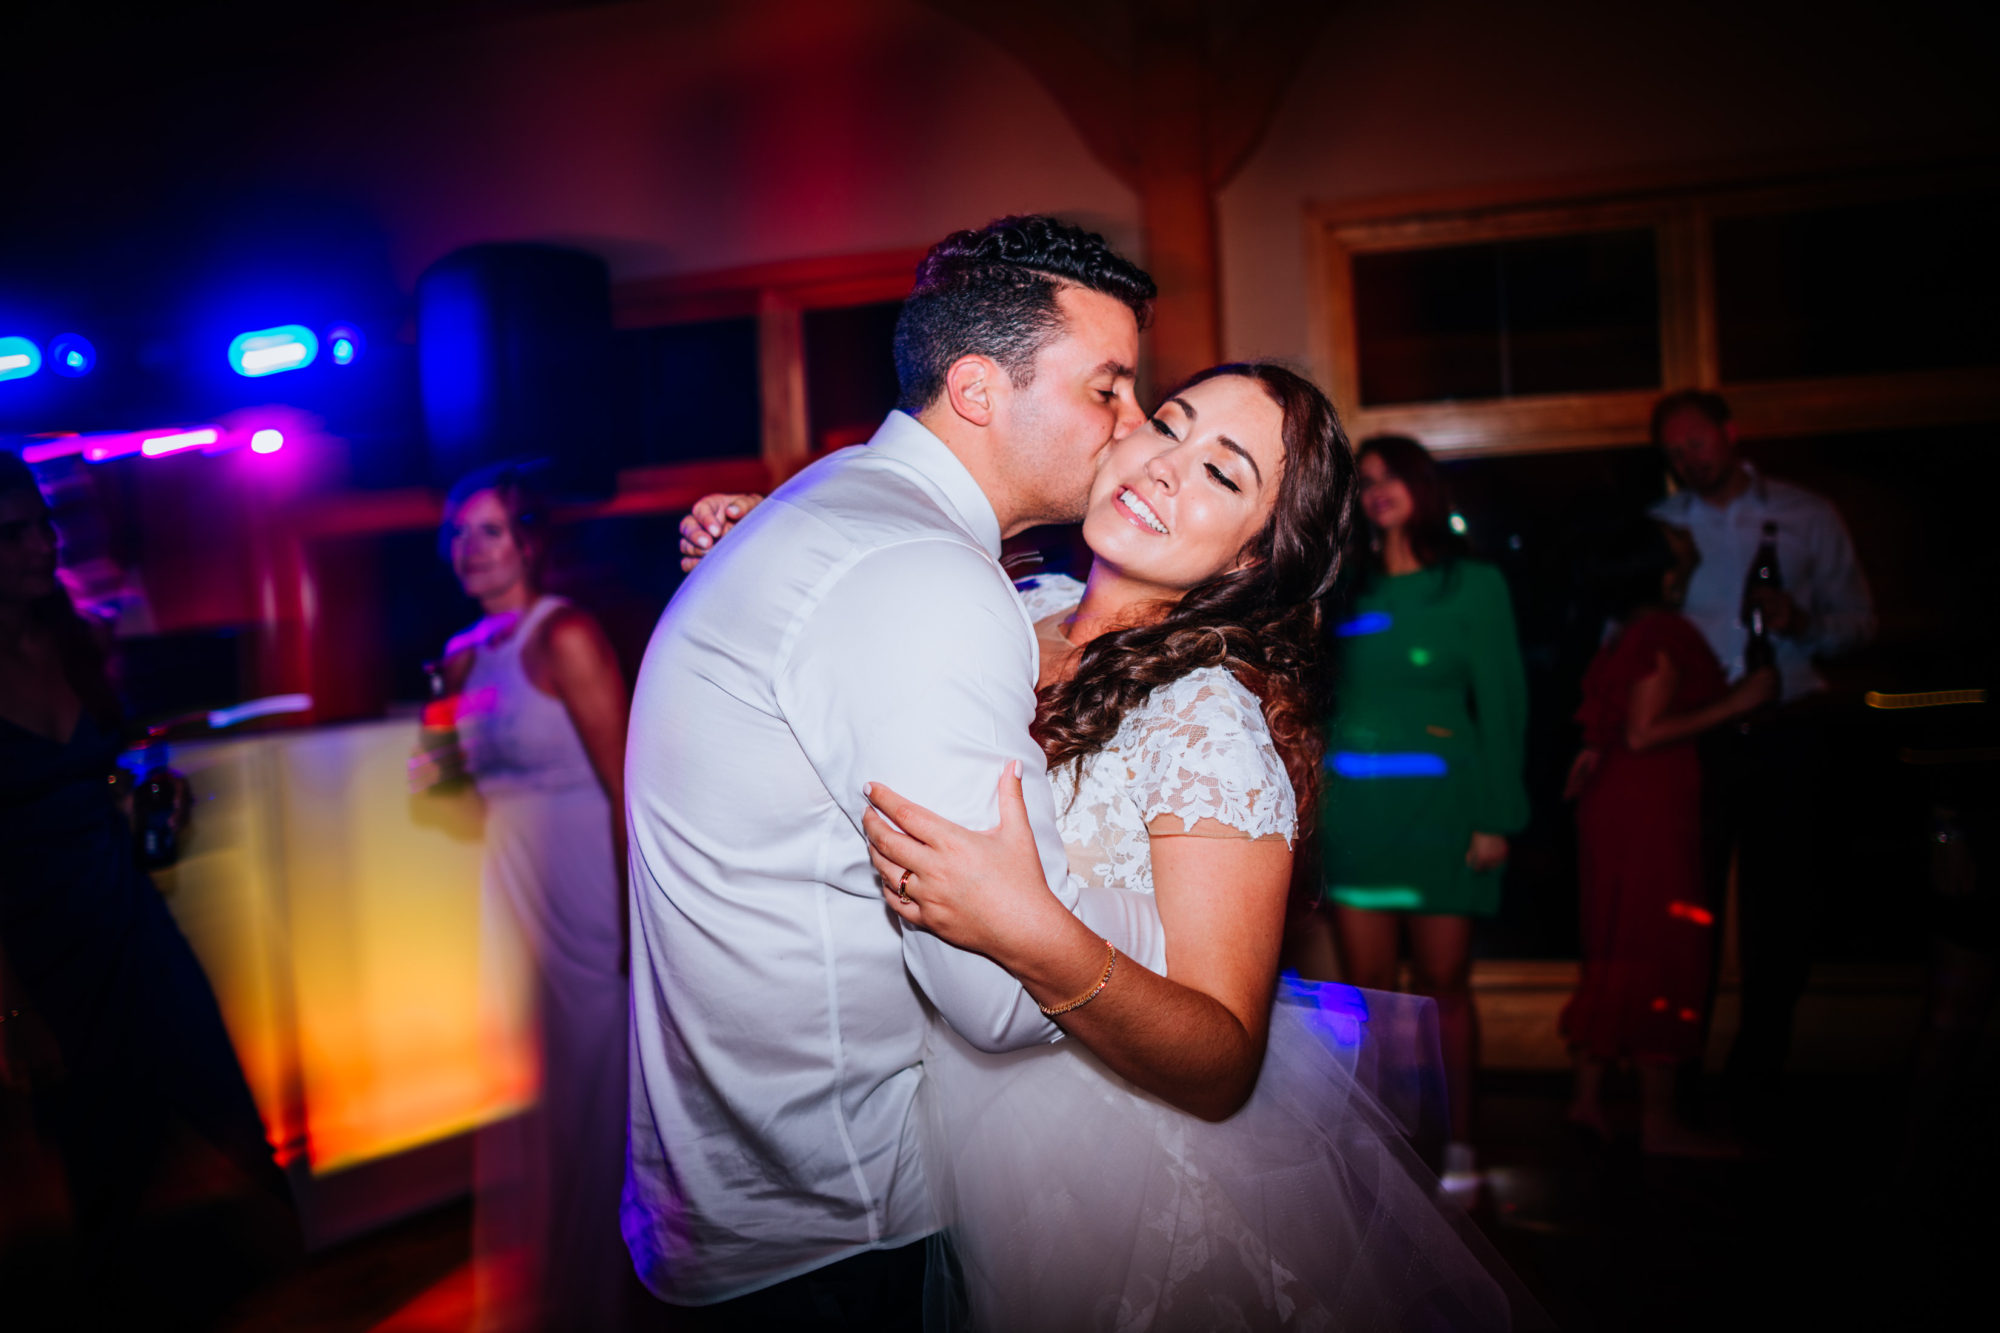 groom kissing bride during reception